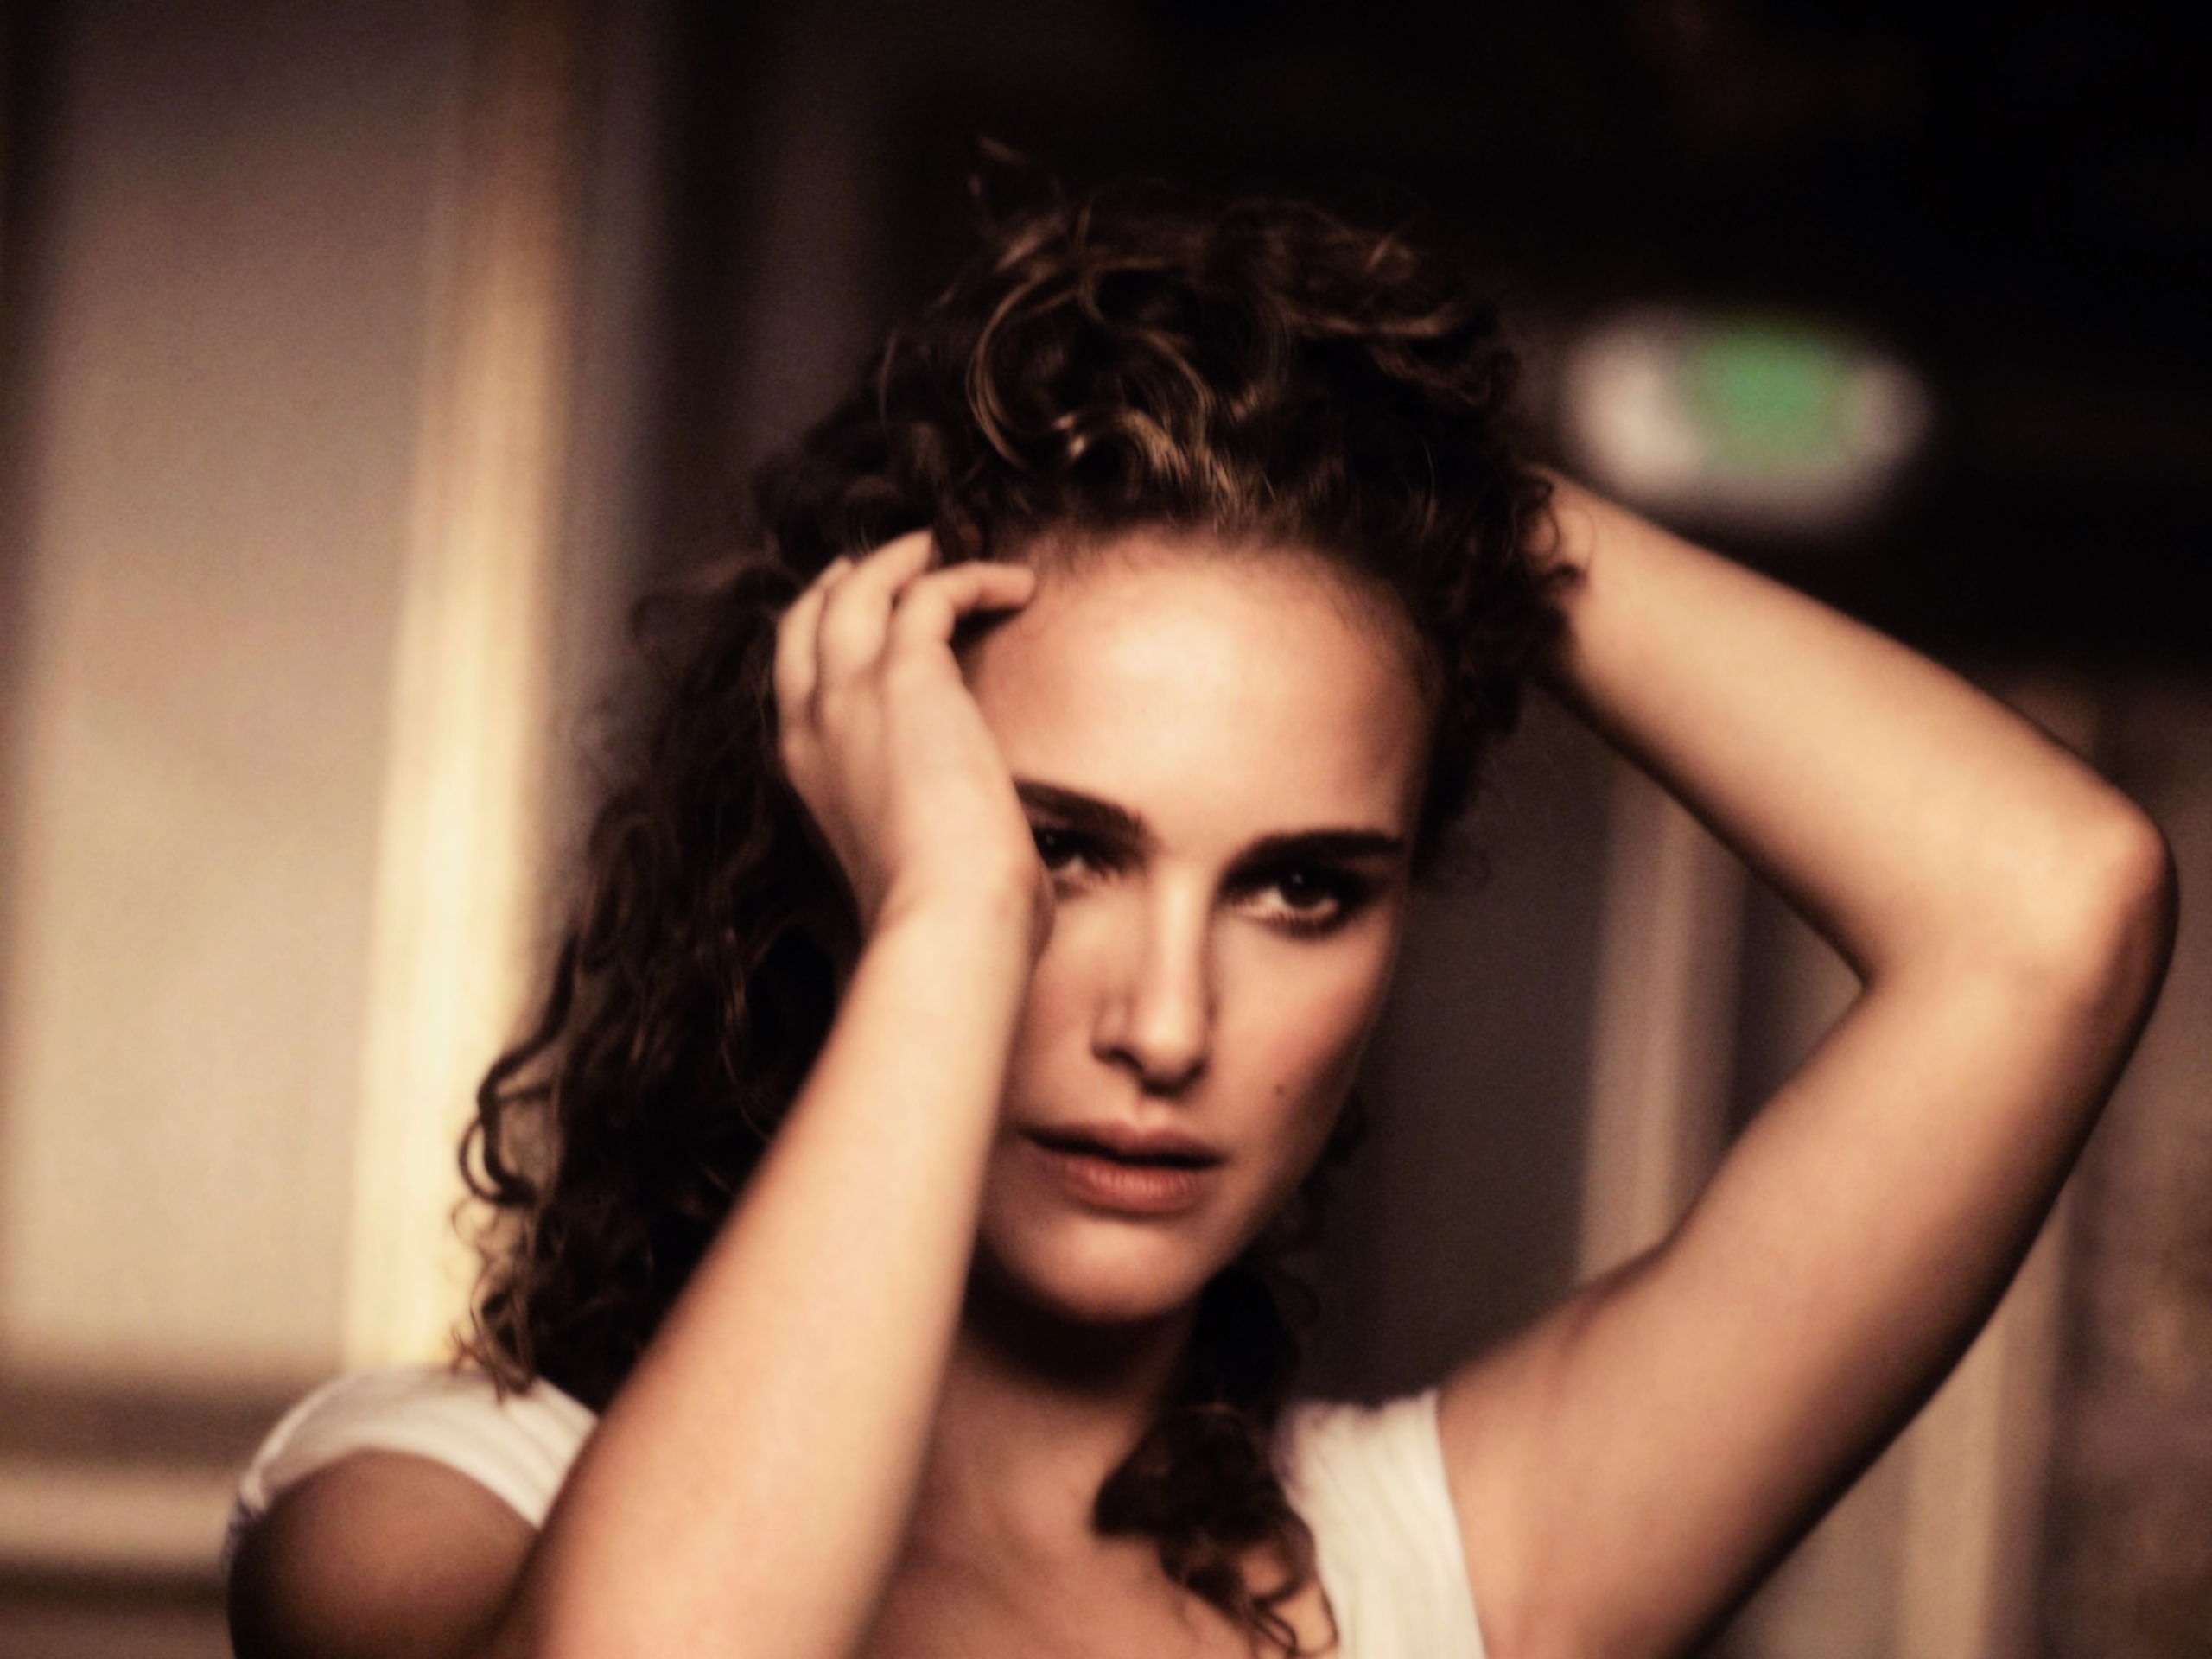 ICloud Natalie Portman naked (75 photos), Tits, Leaked, Twitter, bra 2017